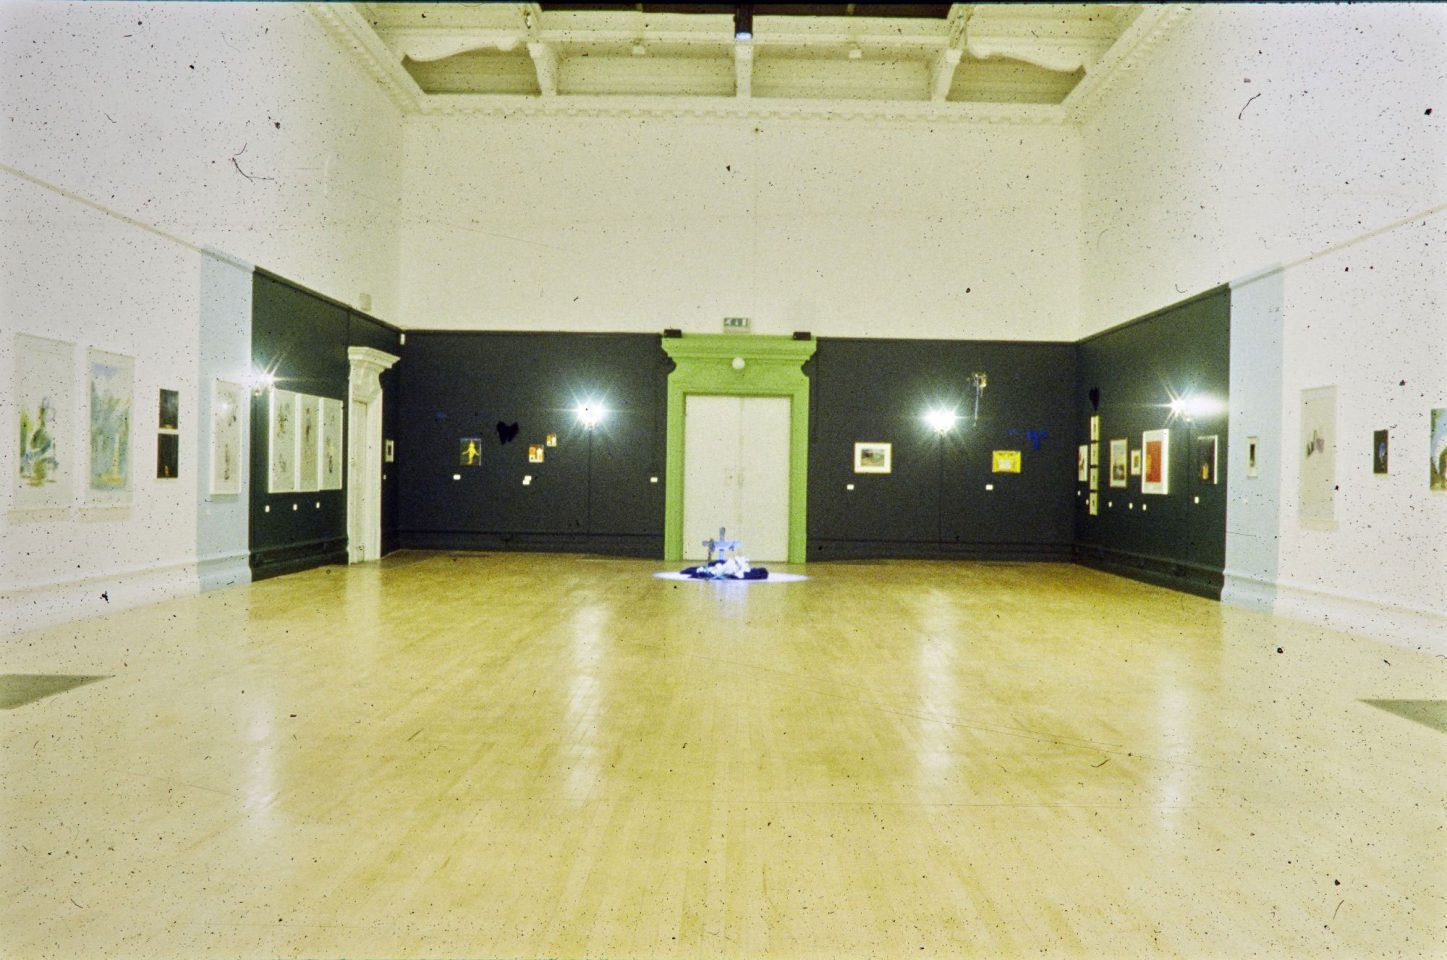 Installation view of Karen Kilimnik's 2000 Solo Exhibition.